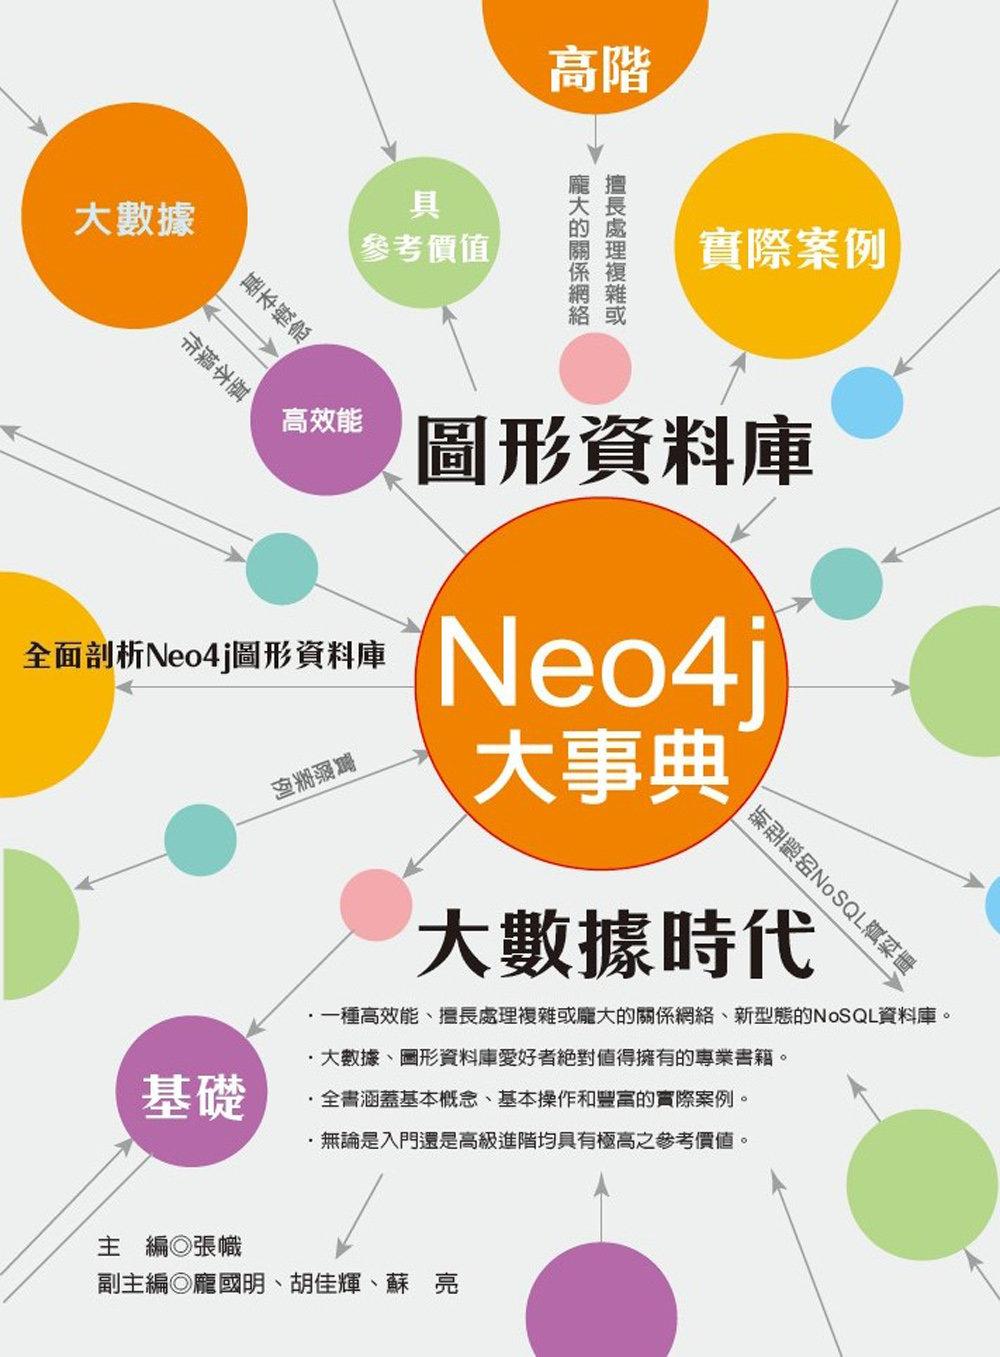 Neo4j 大事典 : 圖形資料庫 & 大數據時代-preview-1